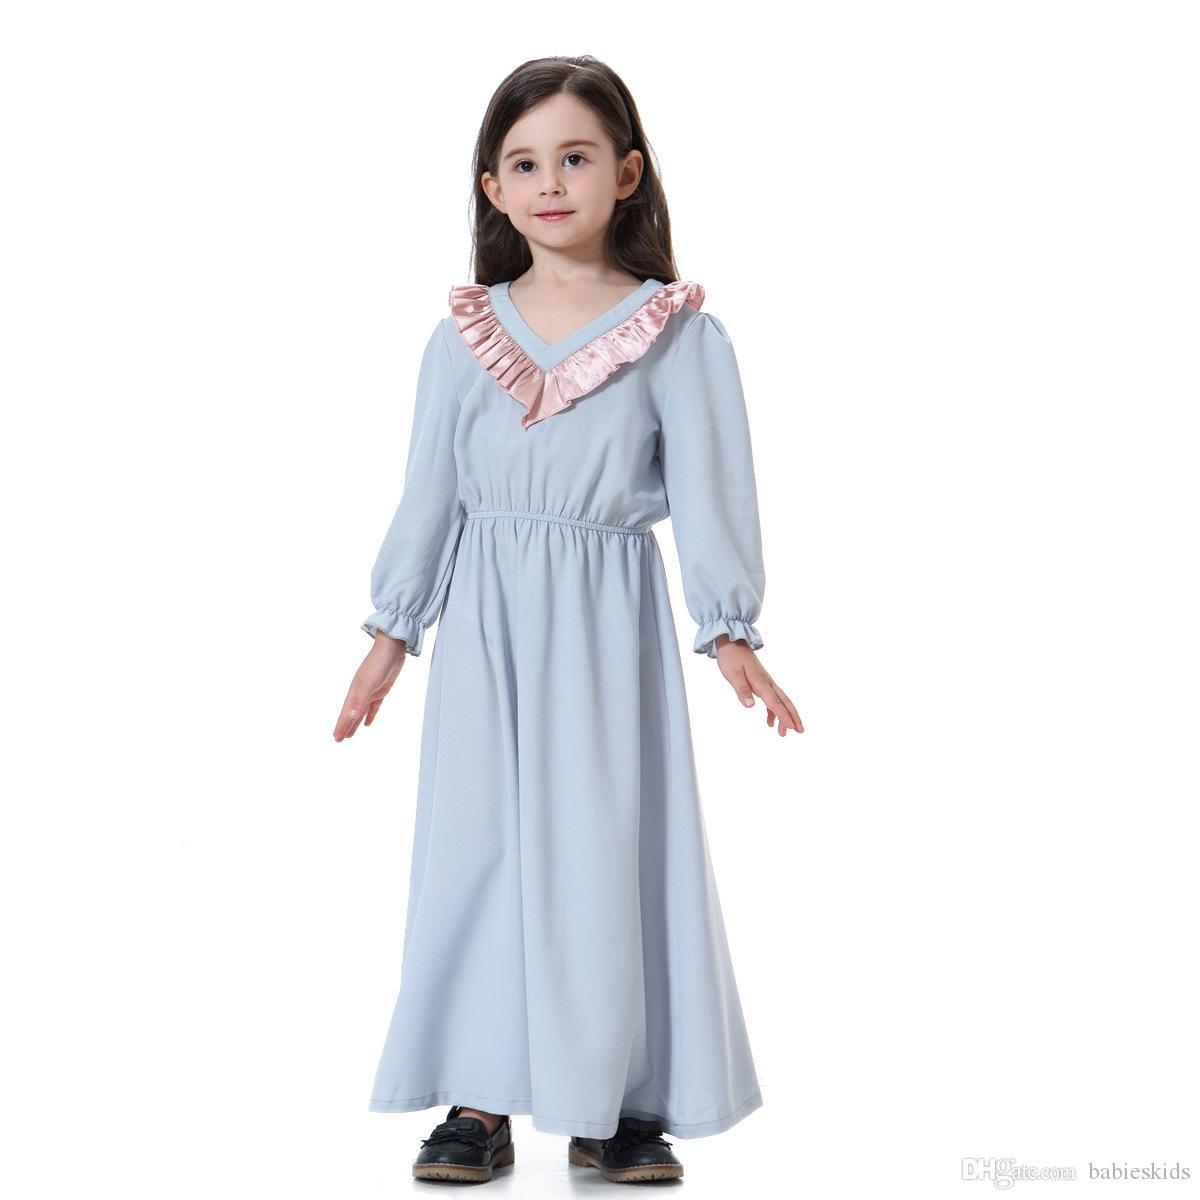 c0e3a5316435 2019 Muslim Kids Dress Fashion Child Dubai Abayas Islamic Ruffles Petal  Sleeve Islamic Traditional Kids Clothing Long Sleeve From Babieskids, ...